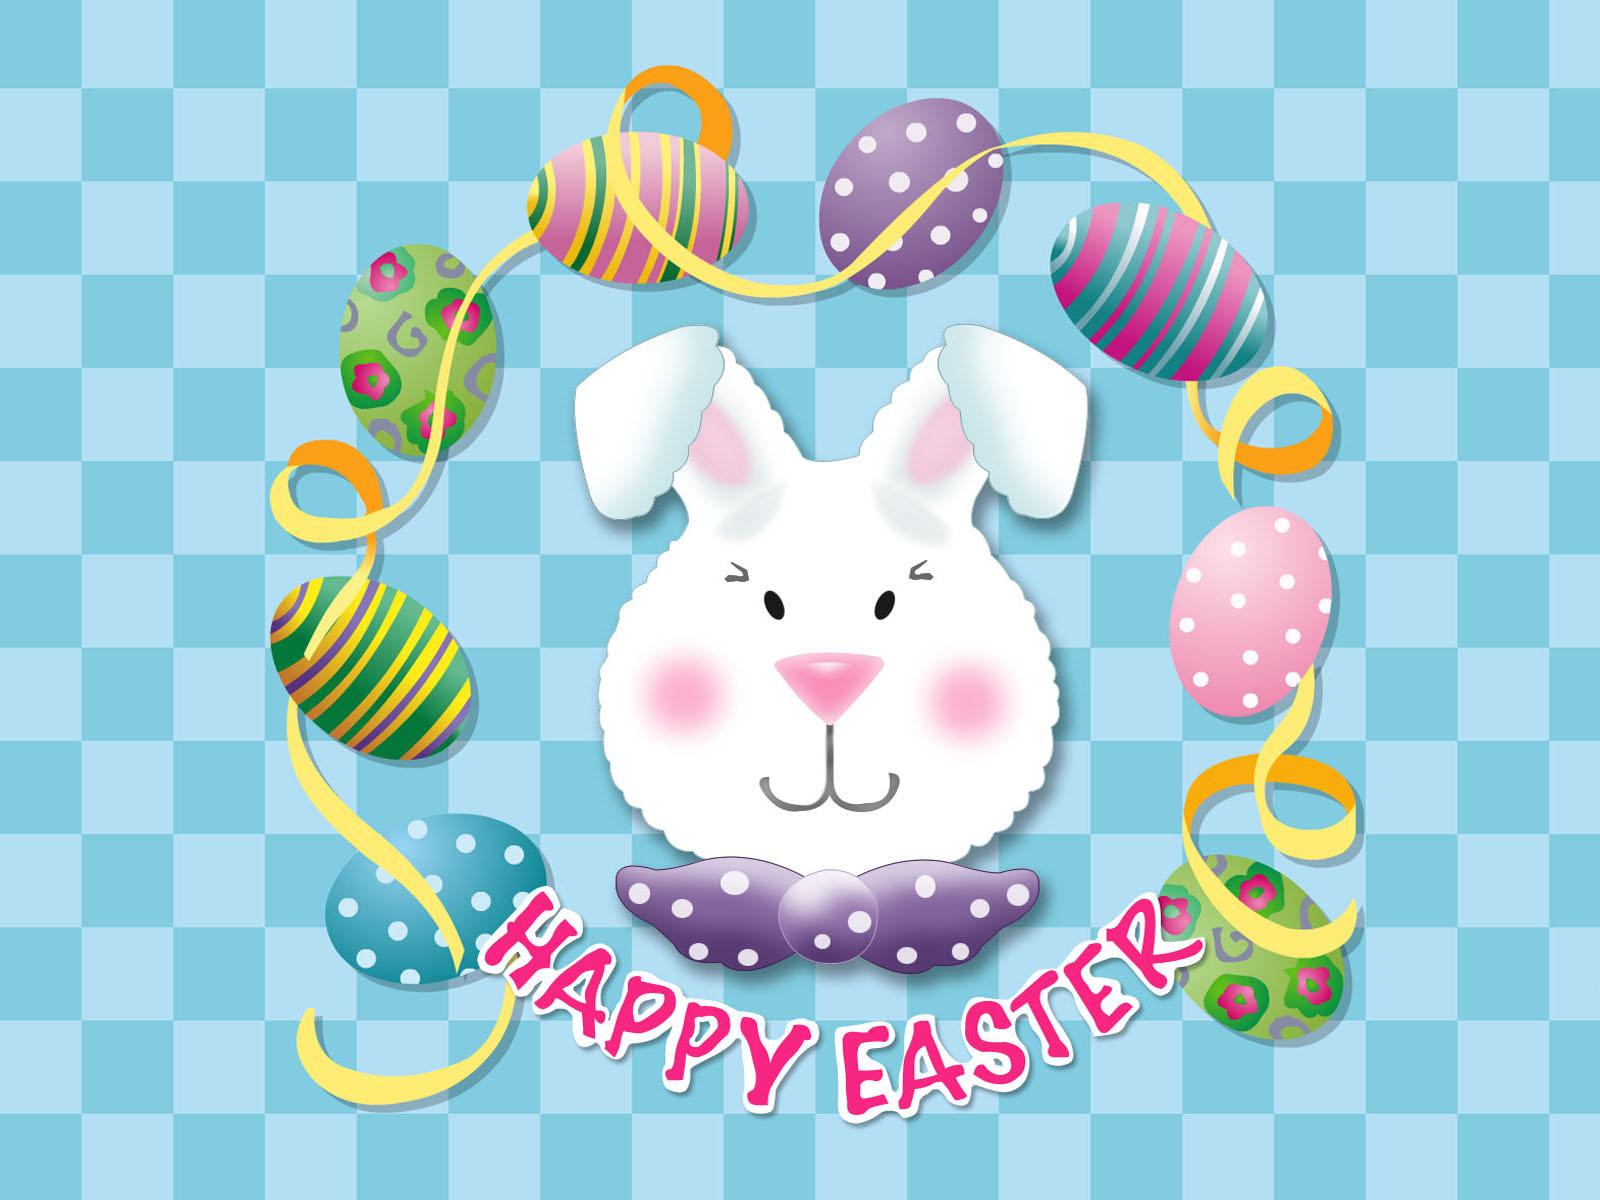 Happy Easter Wallpaper 2011